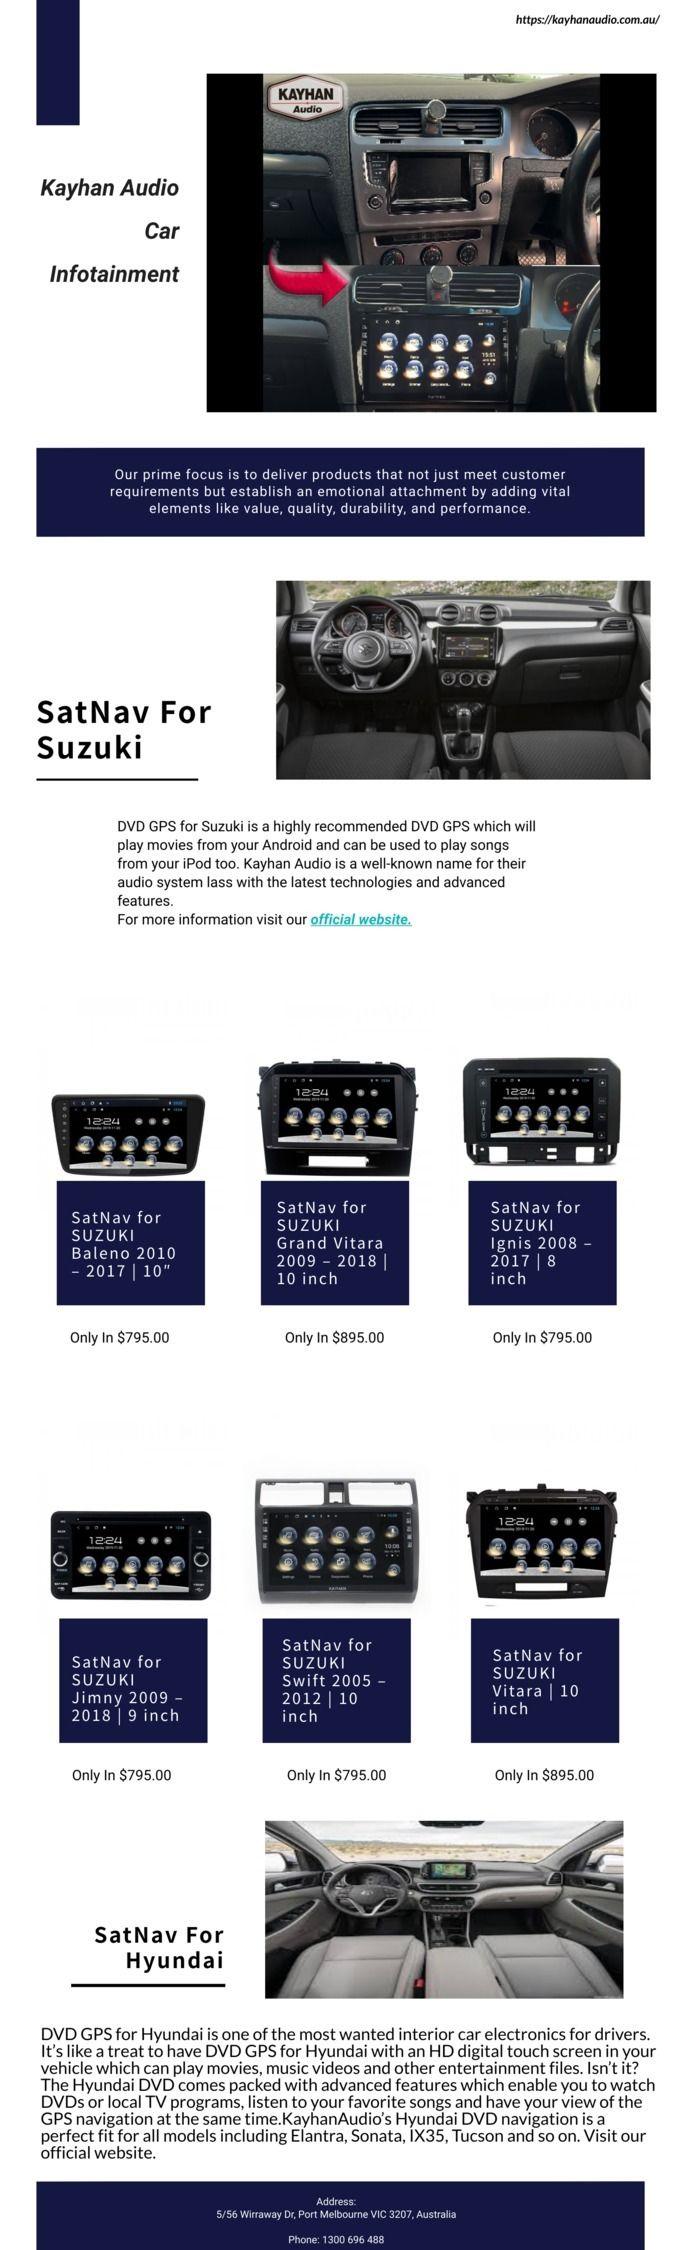 SatNav Suzuki Affordable Price  - kayhanaudio | ello